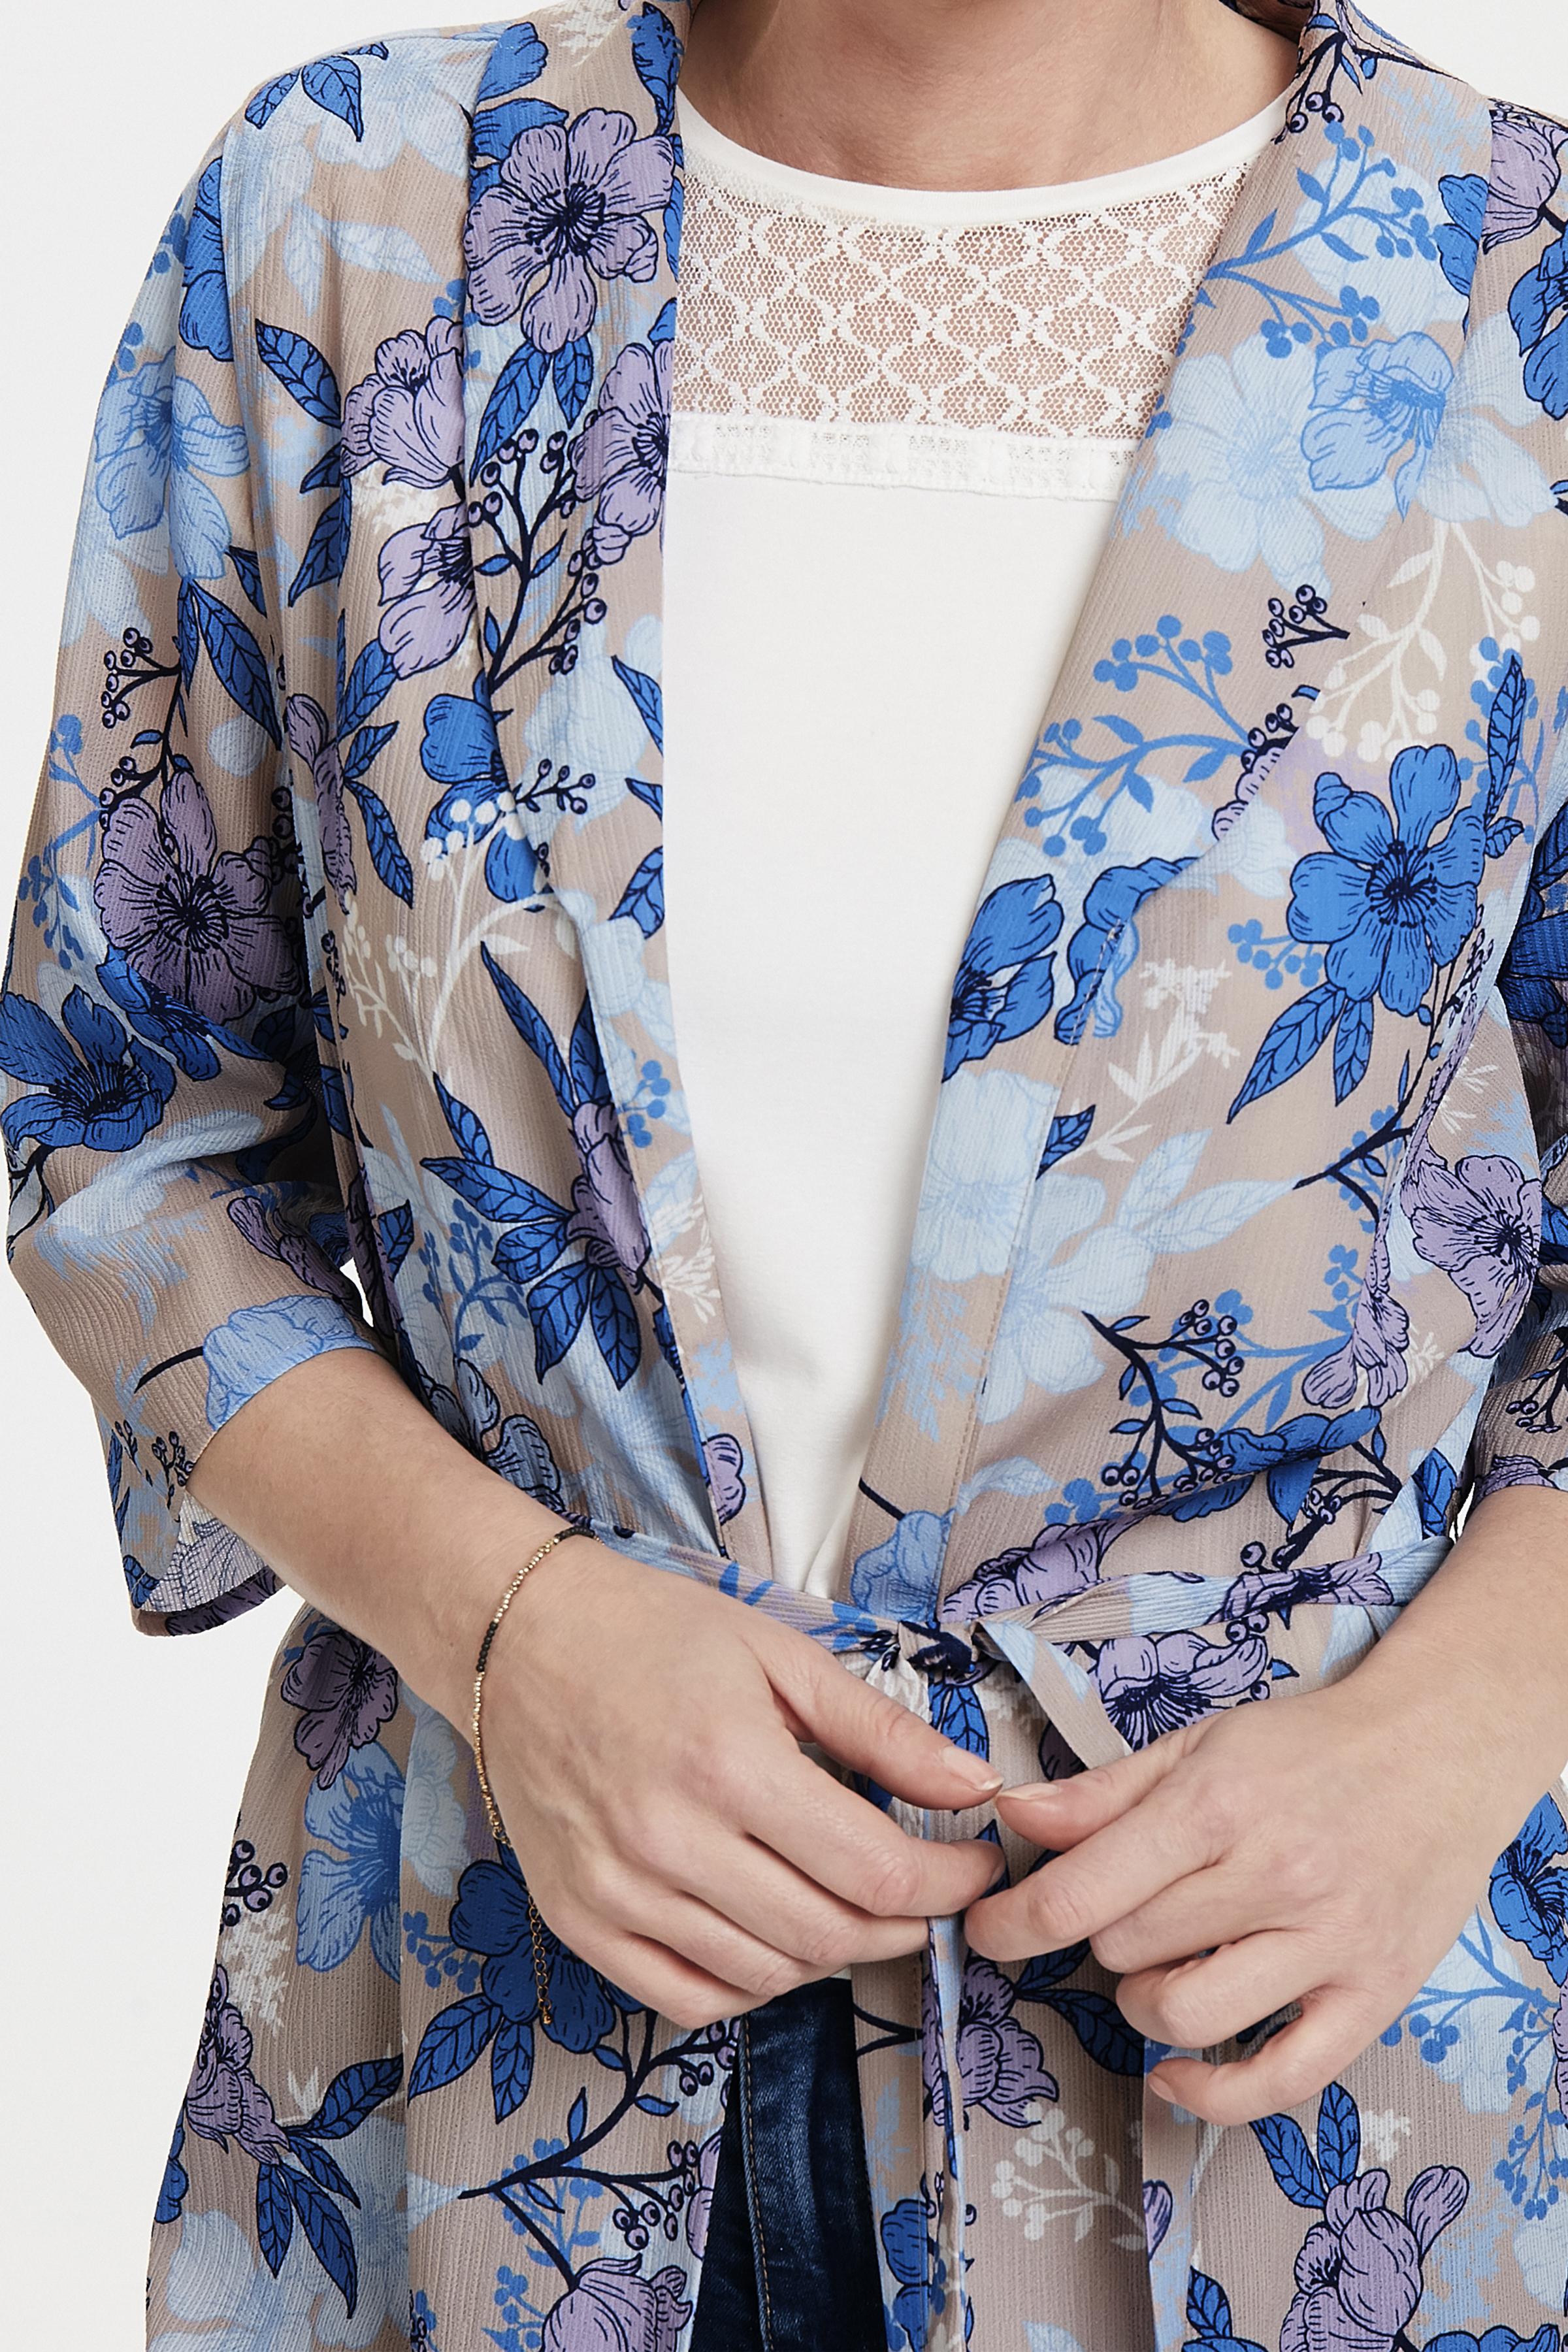 Hellgrau/blau Kimono von Dranella – Shoppen Sie Hellgrau/blau Kimono ab Gr. XS-XXL hier